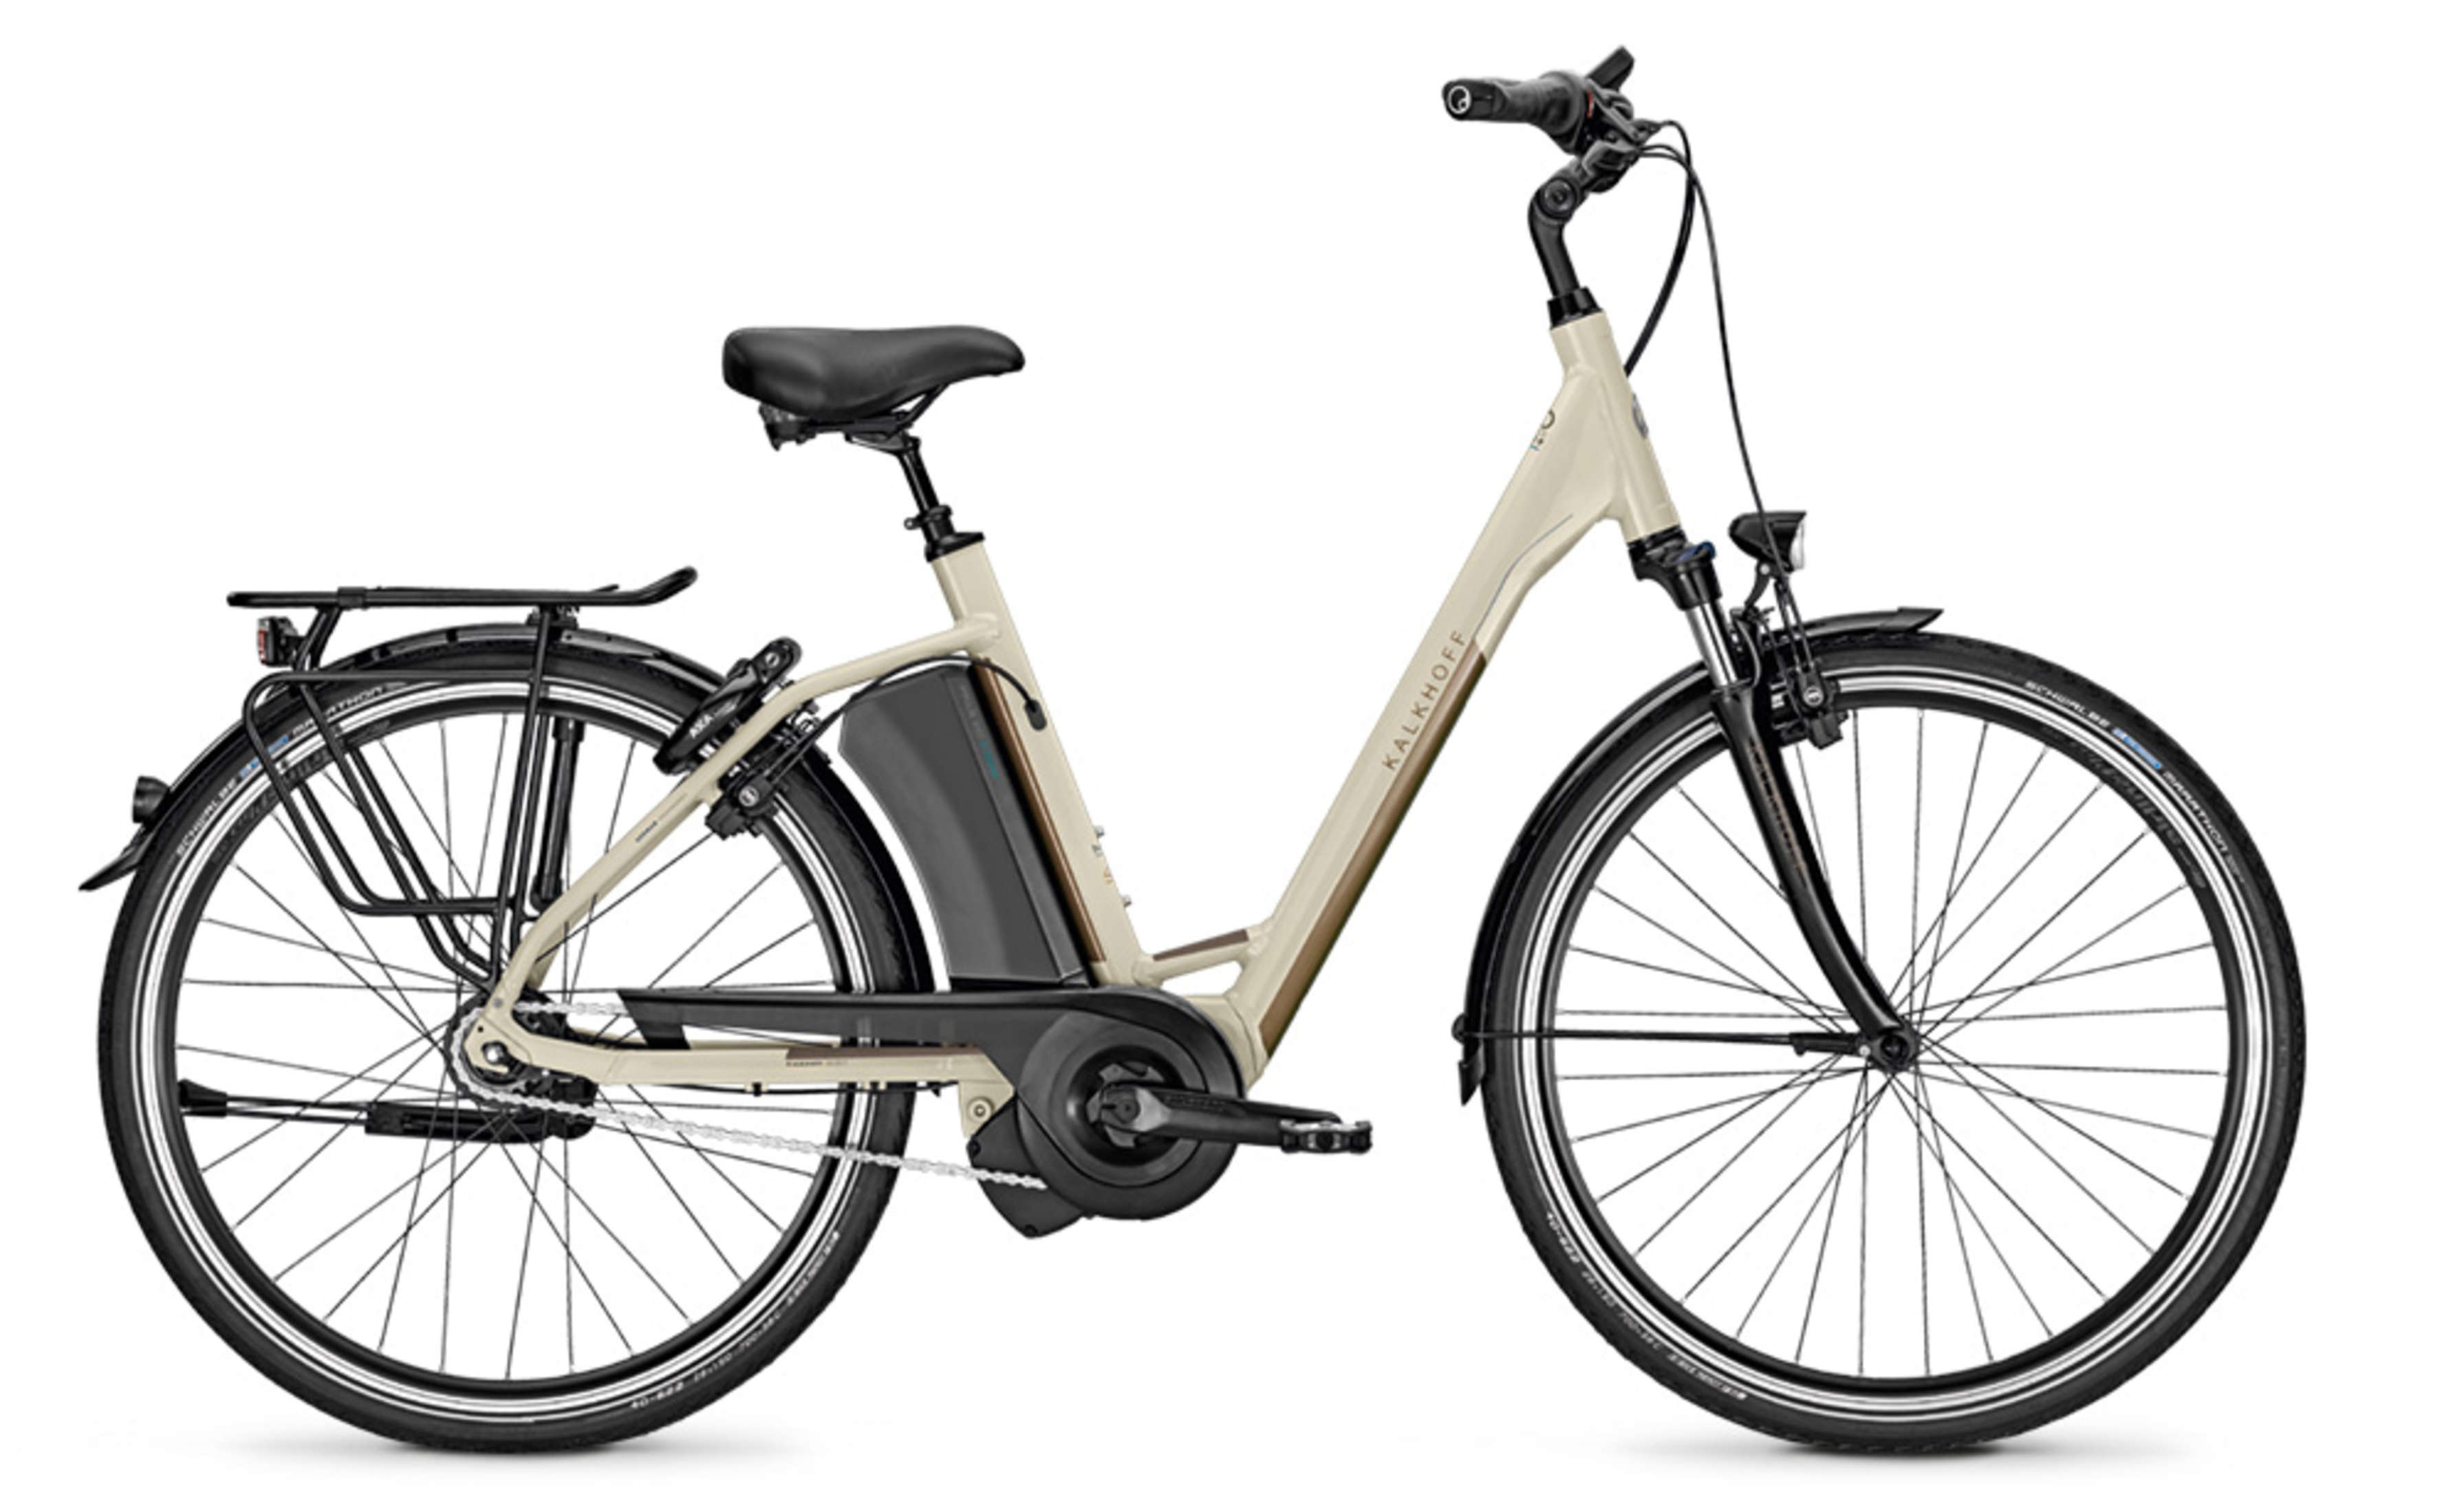 kalkhoff e bike select xxl i8 eurorad bikeleasingeurorad. Black Bedroom Furniture Sets. Home Design Ideas